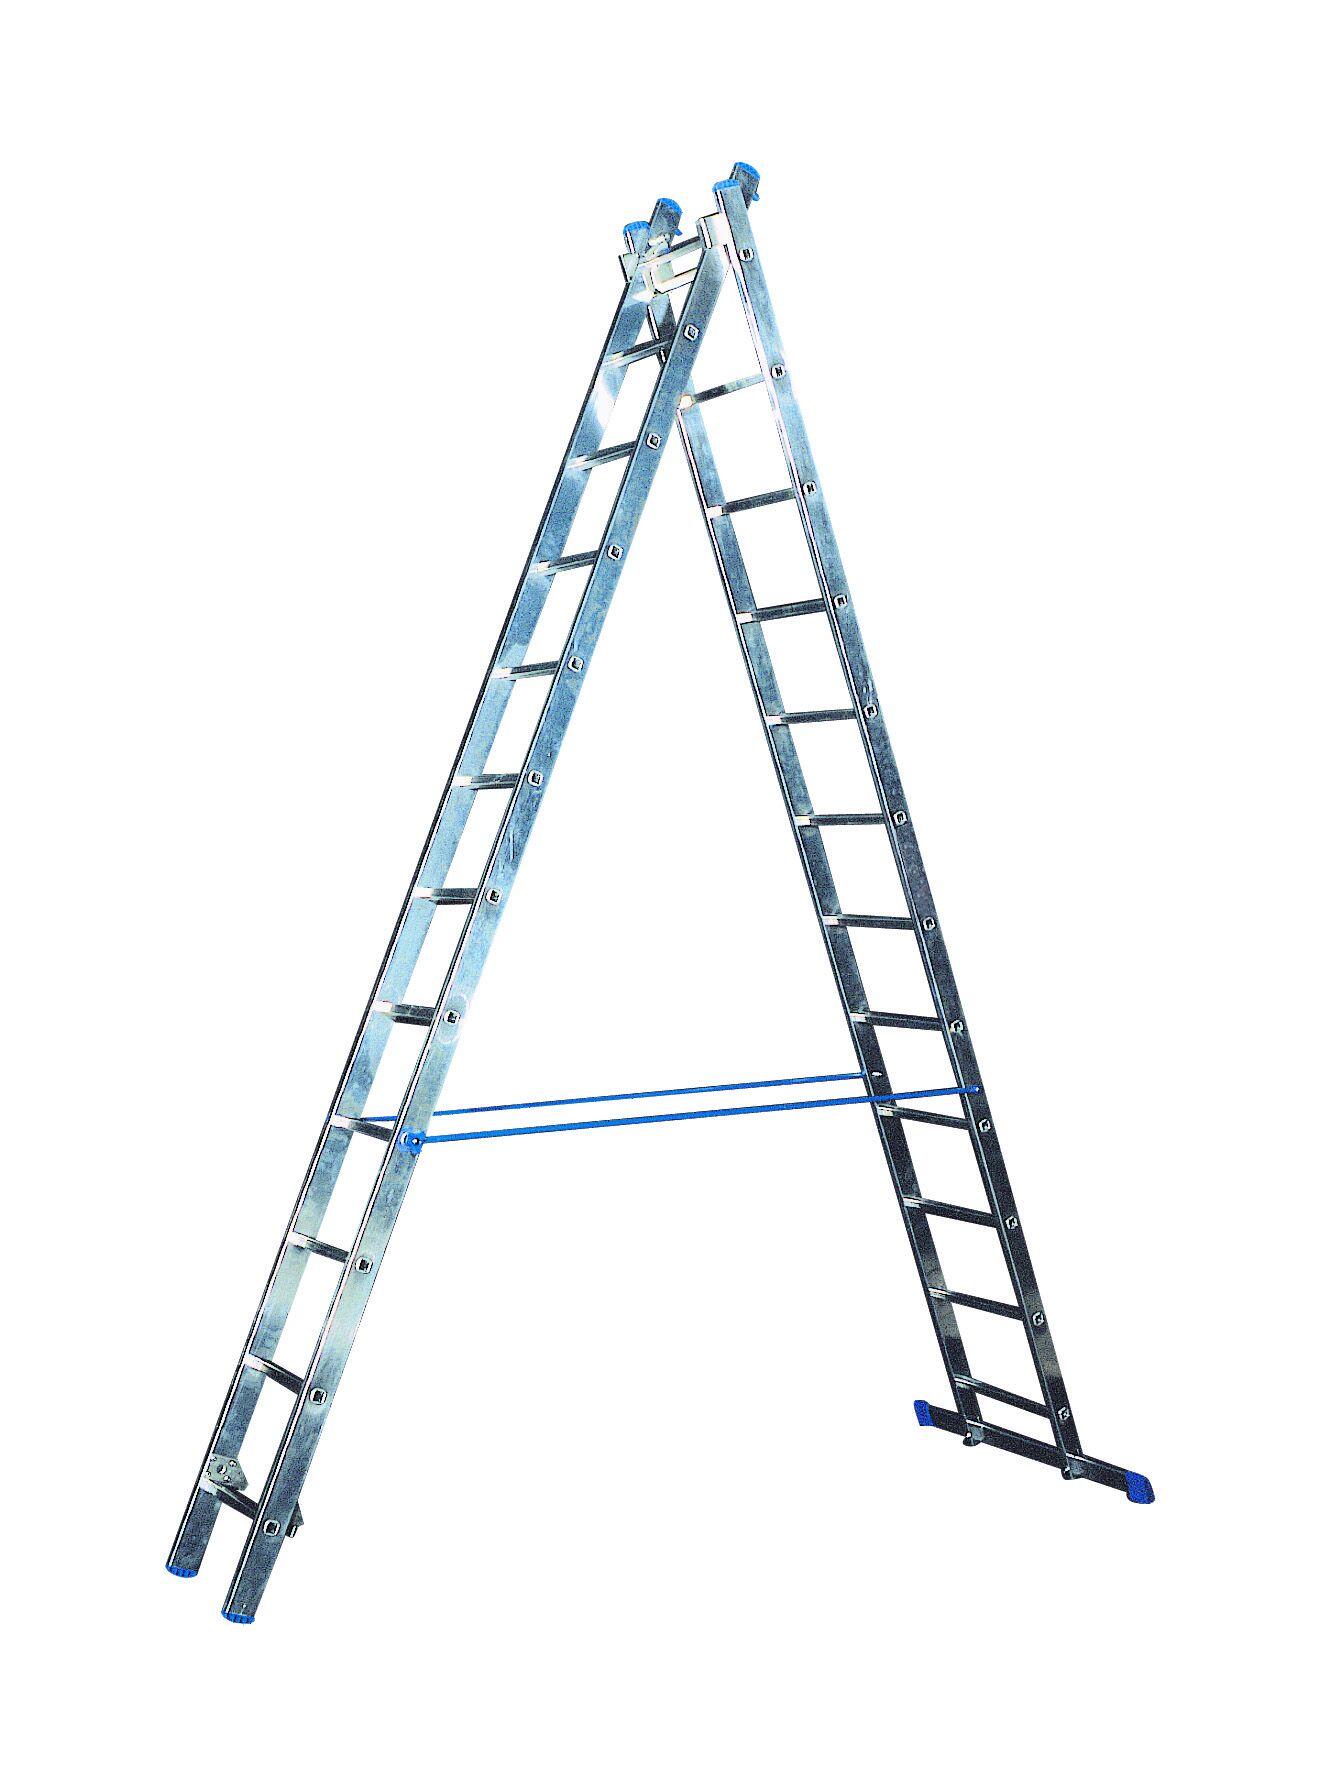 Žebřík hliníkový víceučelový HOBBY VHR H 2x11 Al